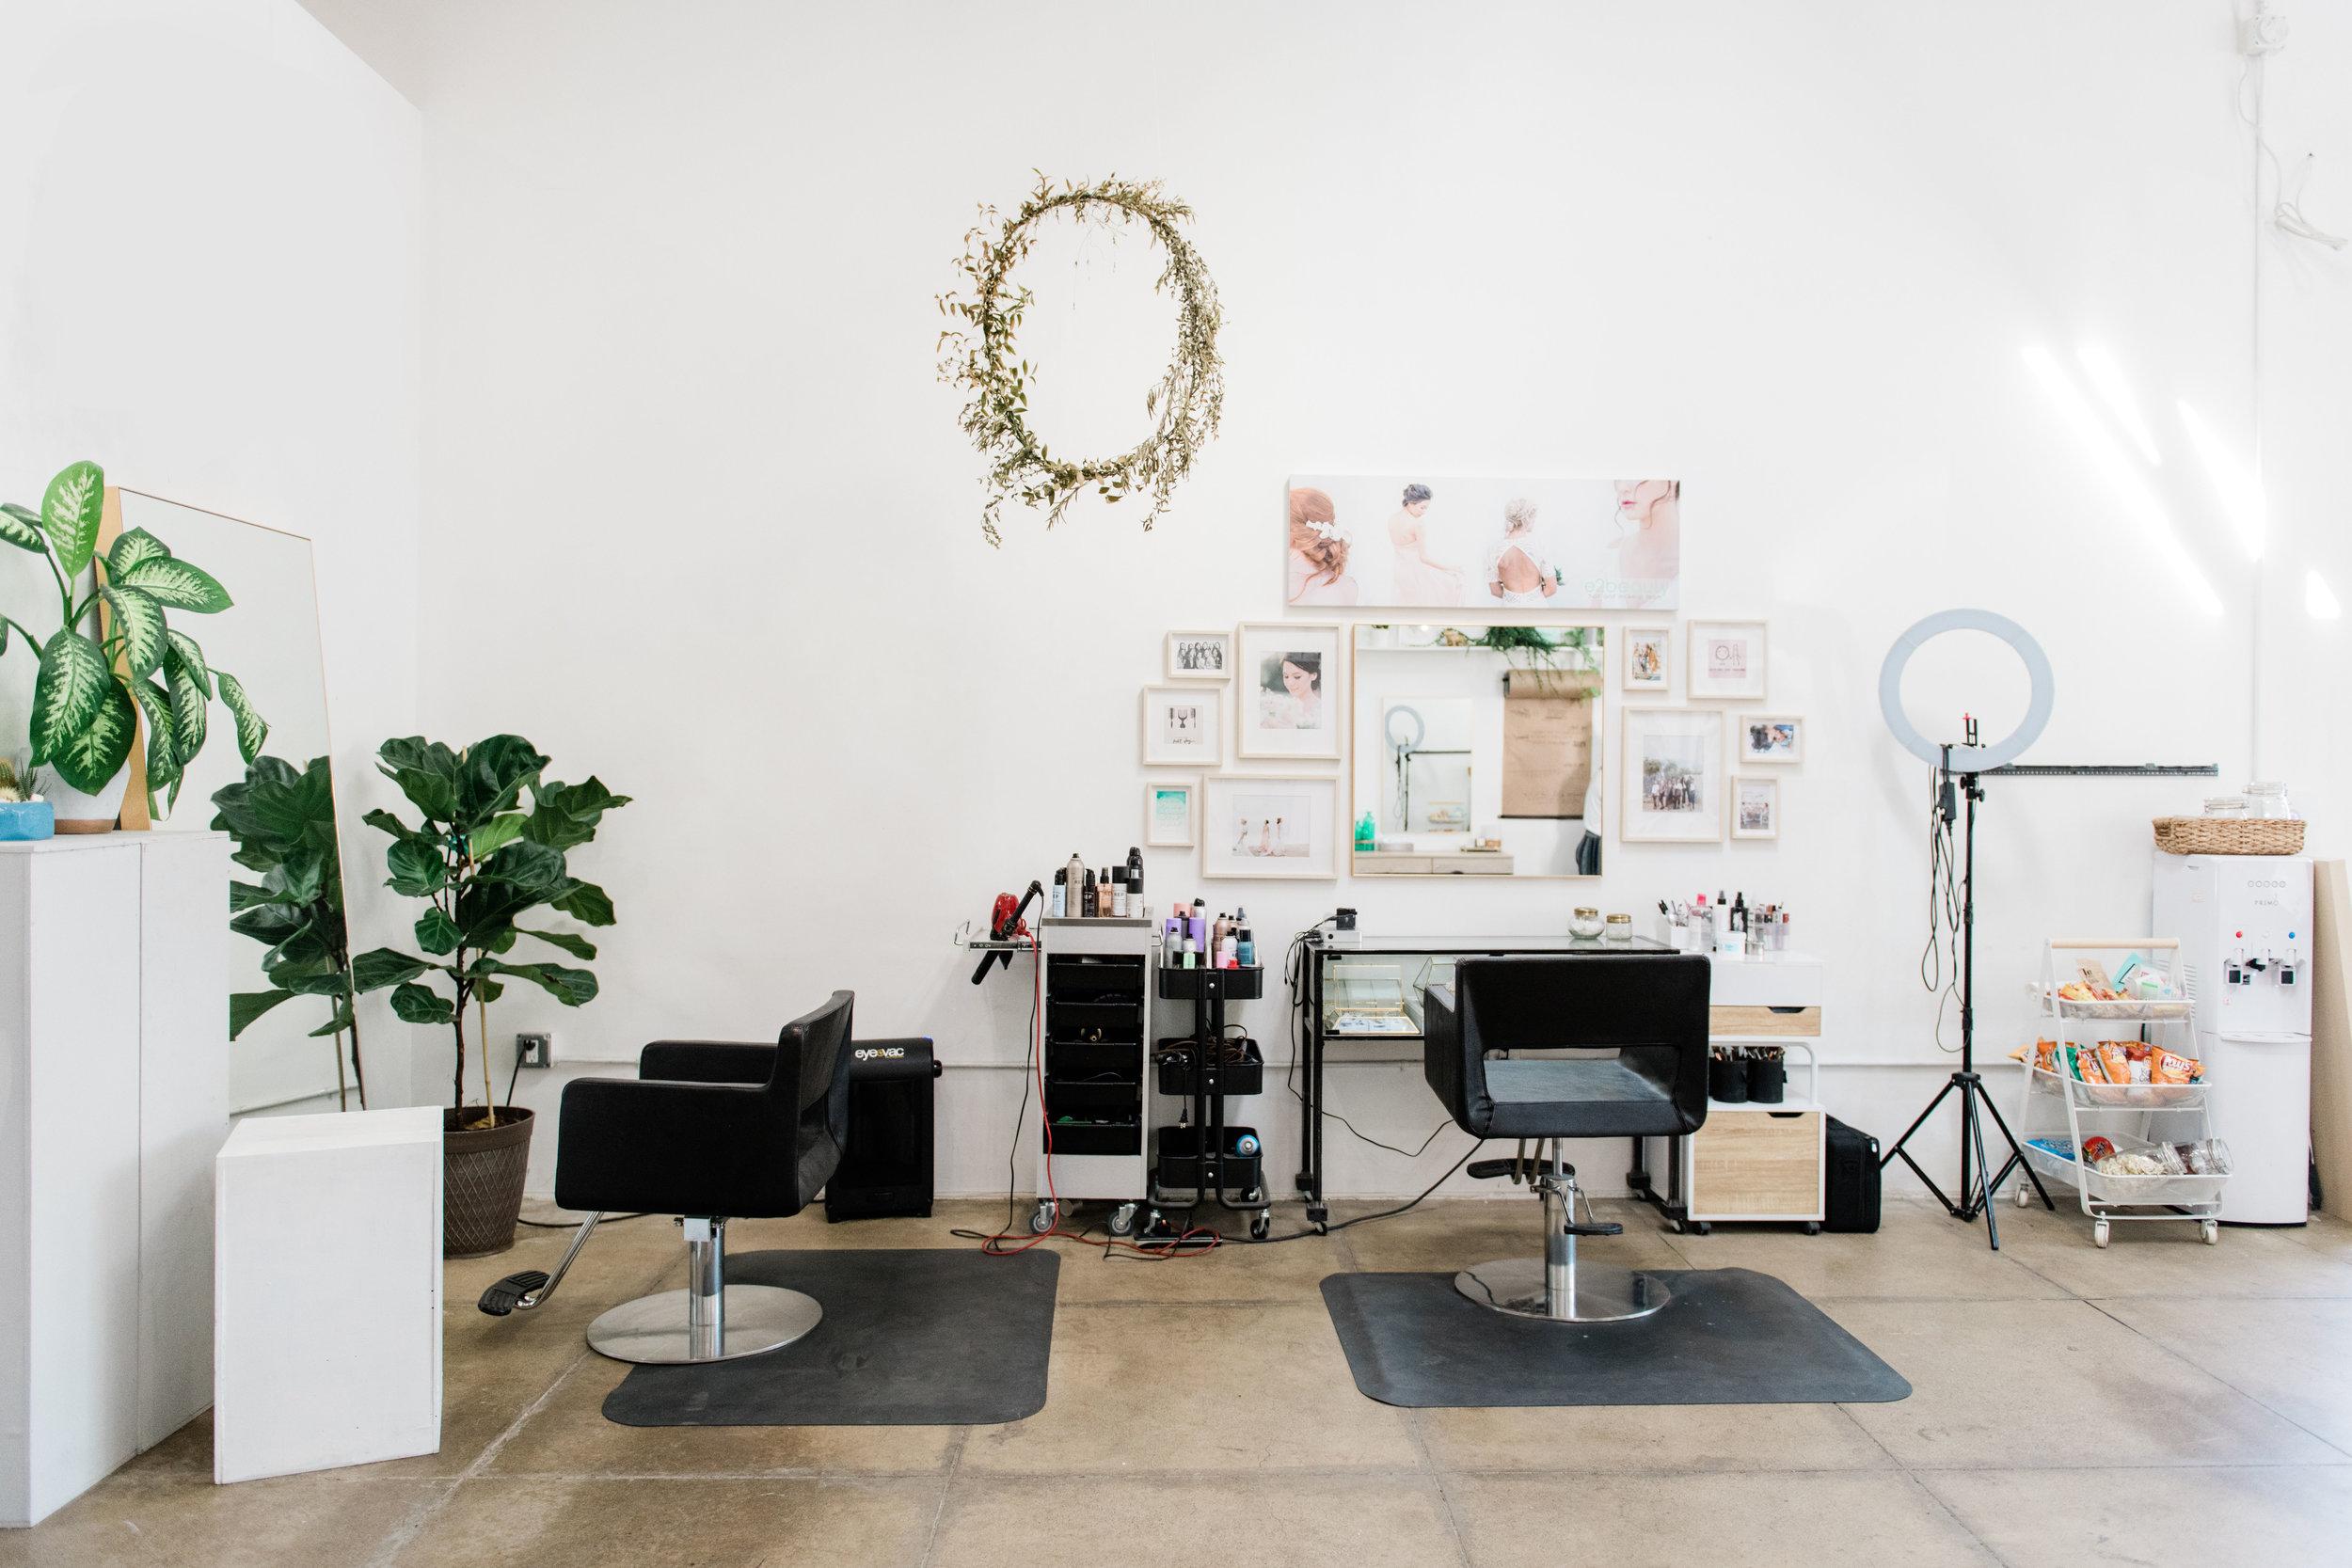 salonchairs.jpg